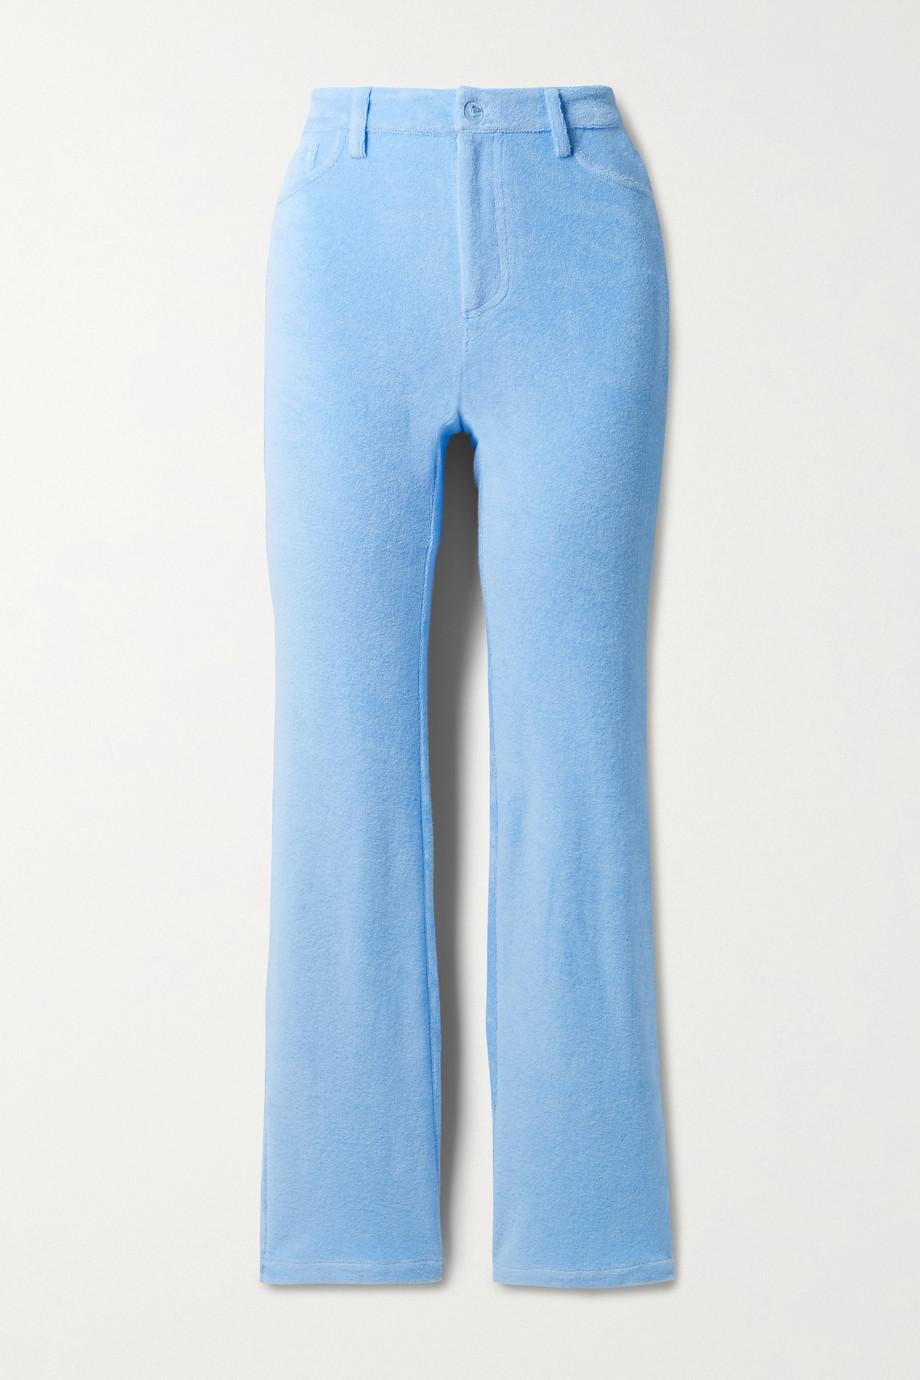 Maisie Wilen Mockumentary cotton-blend terry straight-leg pants